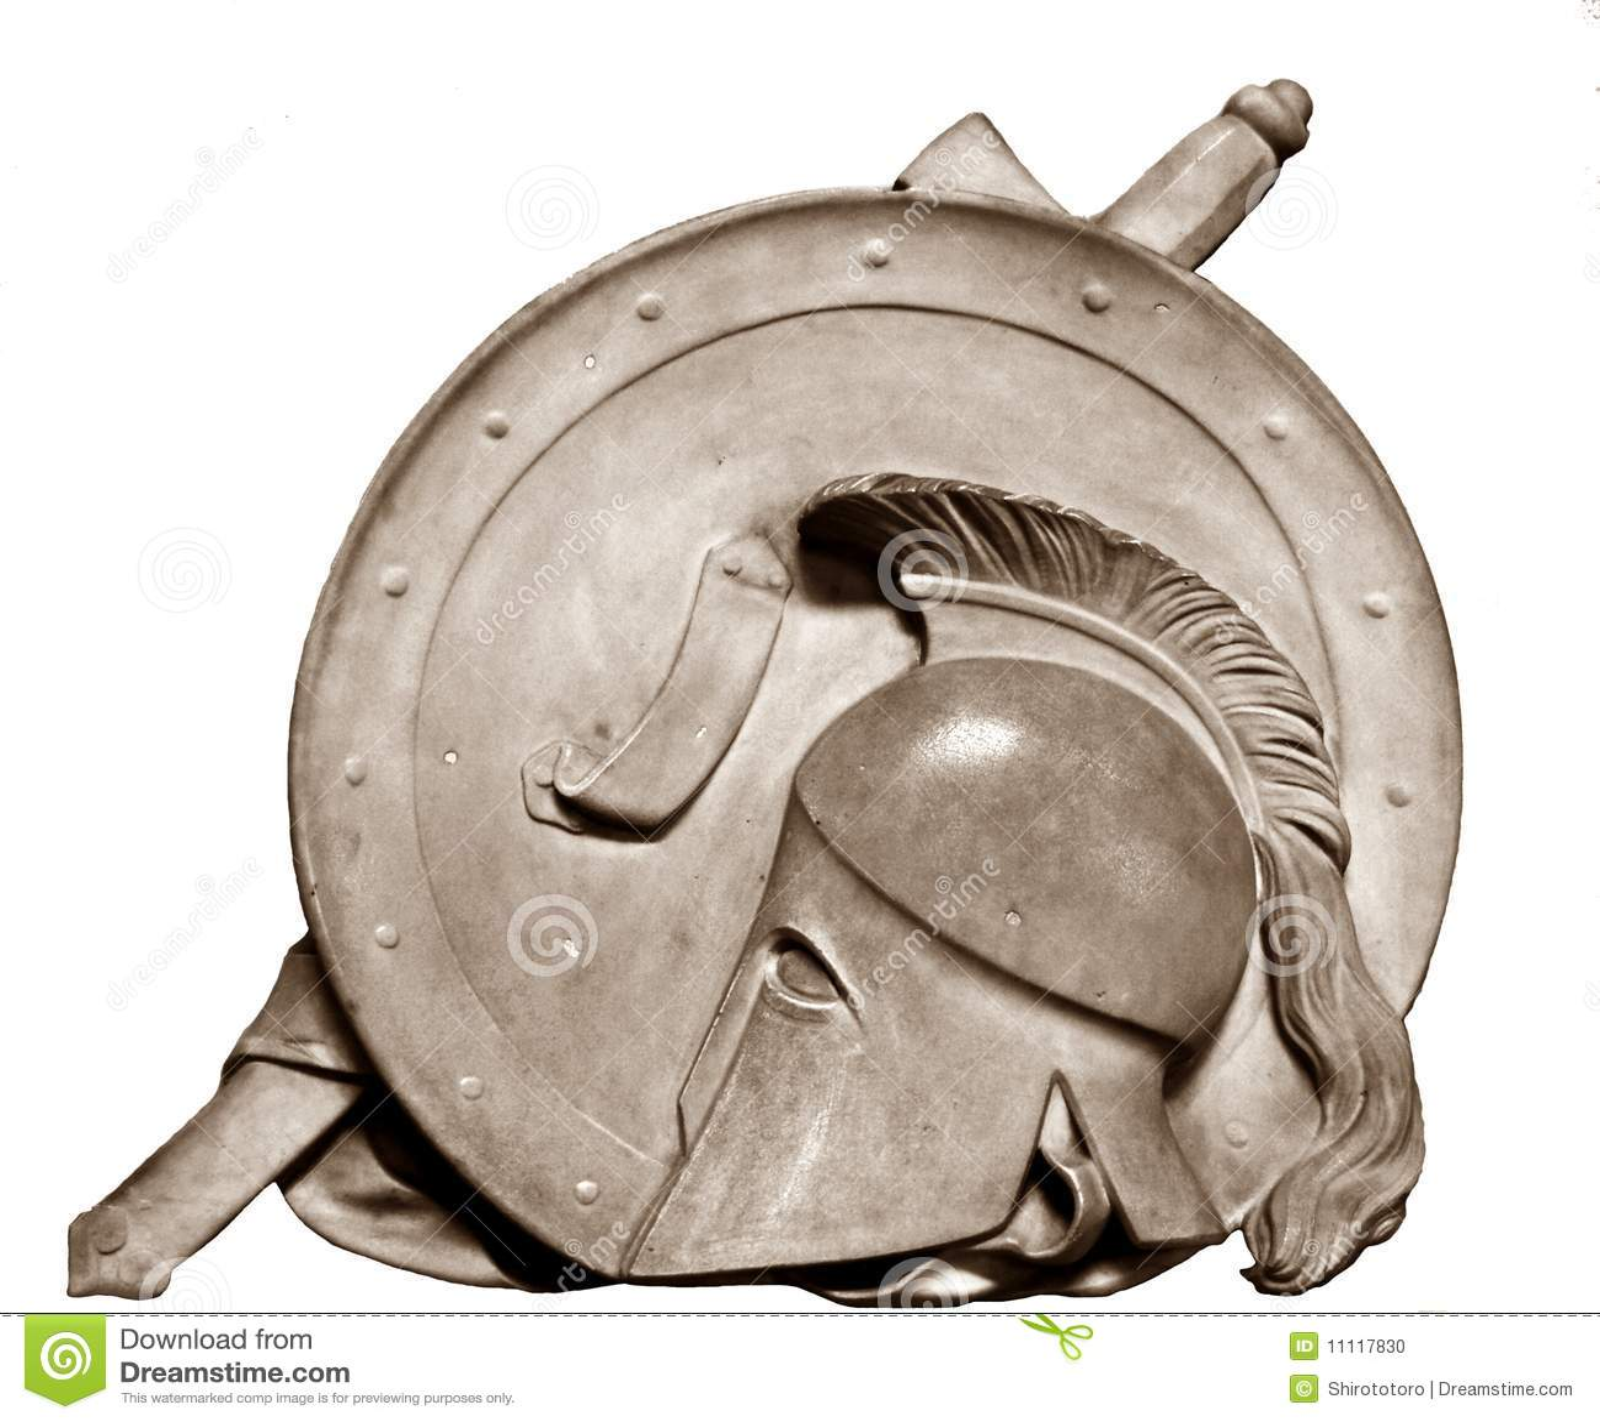 trojan sword and shield - 800×666